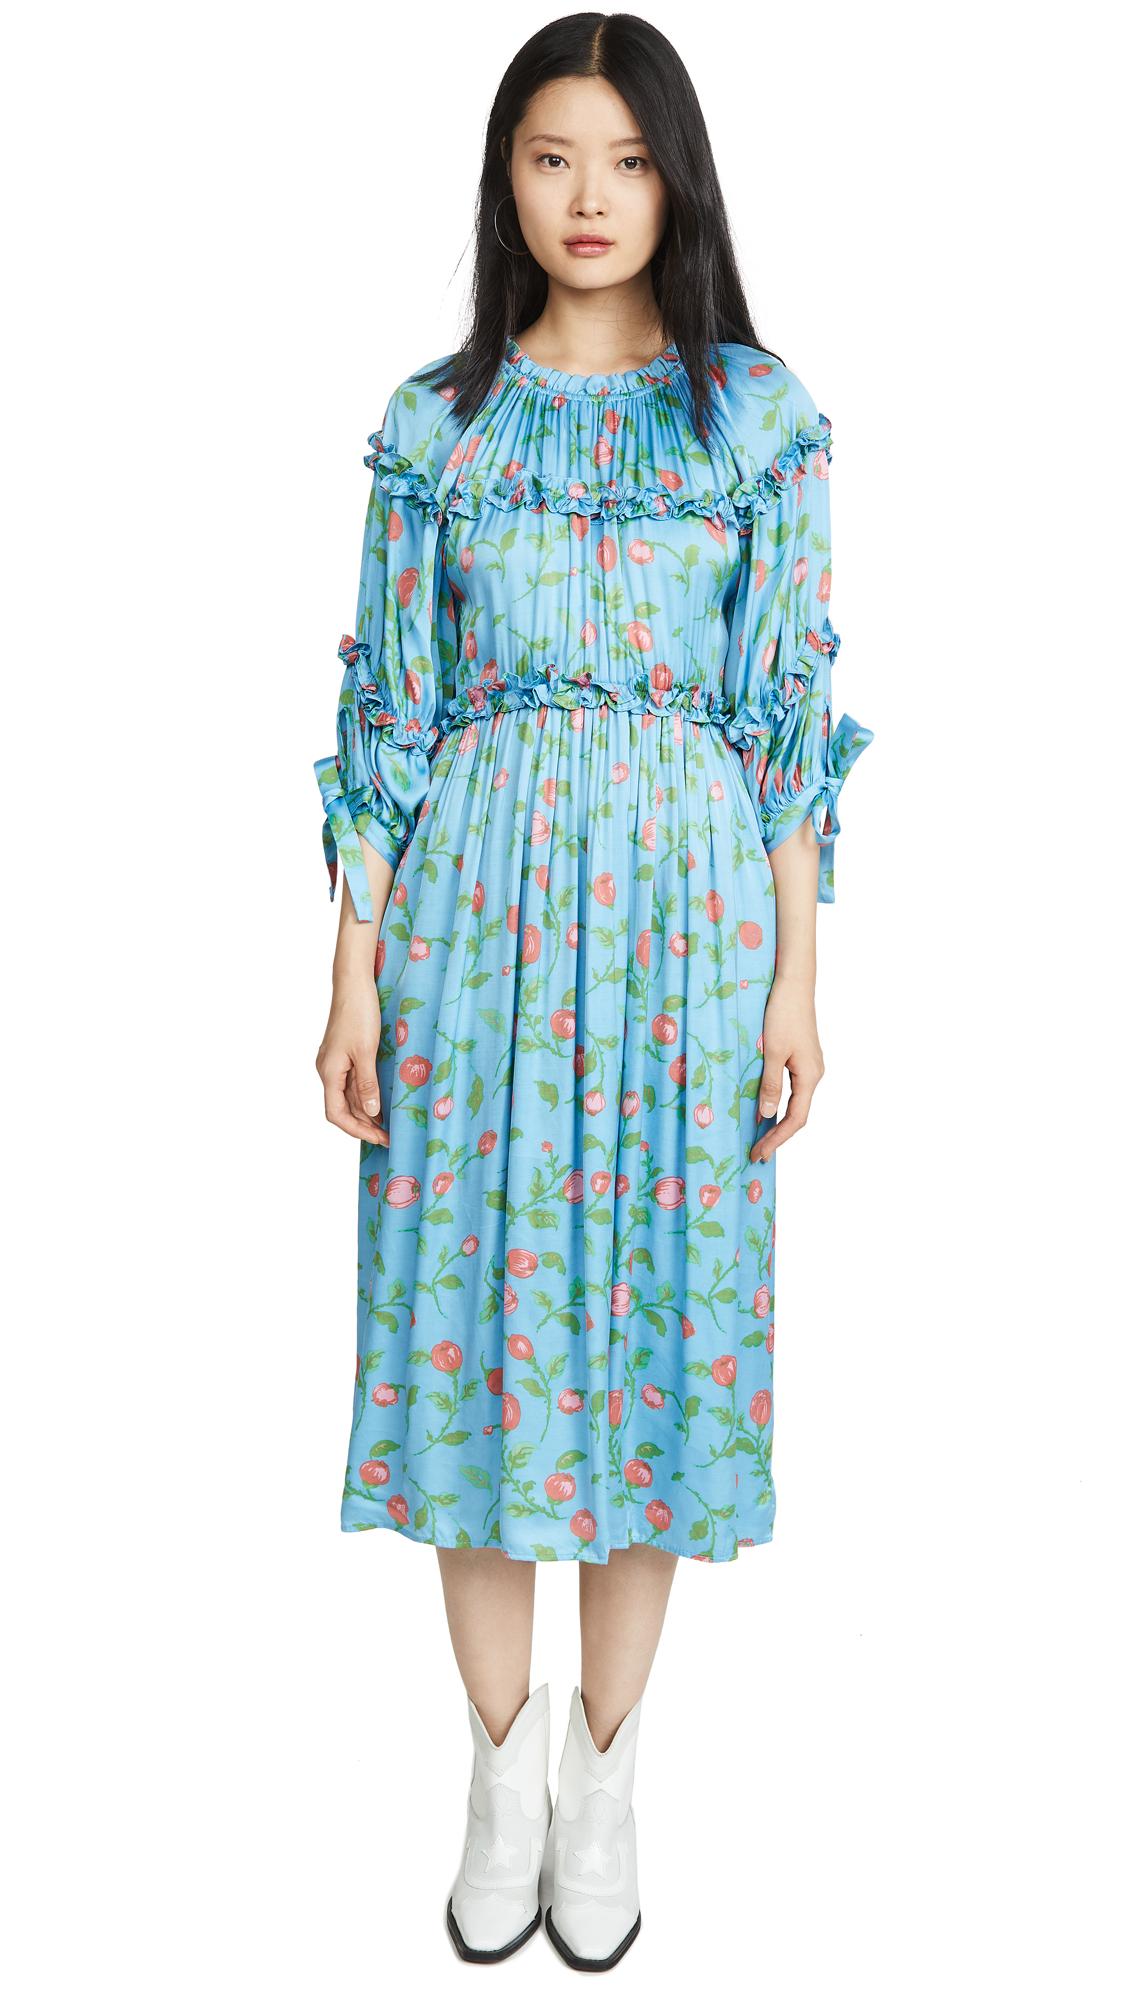 Hofmann Copenhagen Mirielle Dress - 50% Off Sale